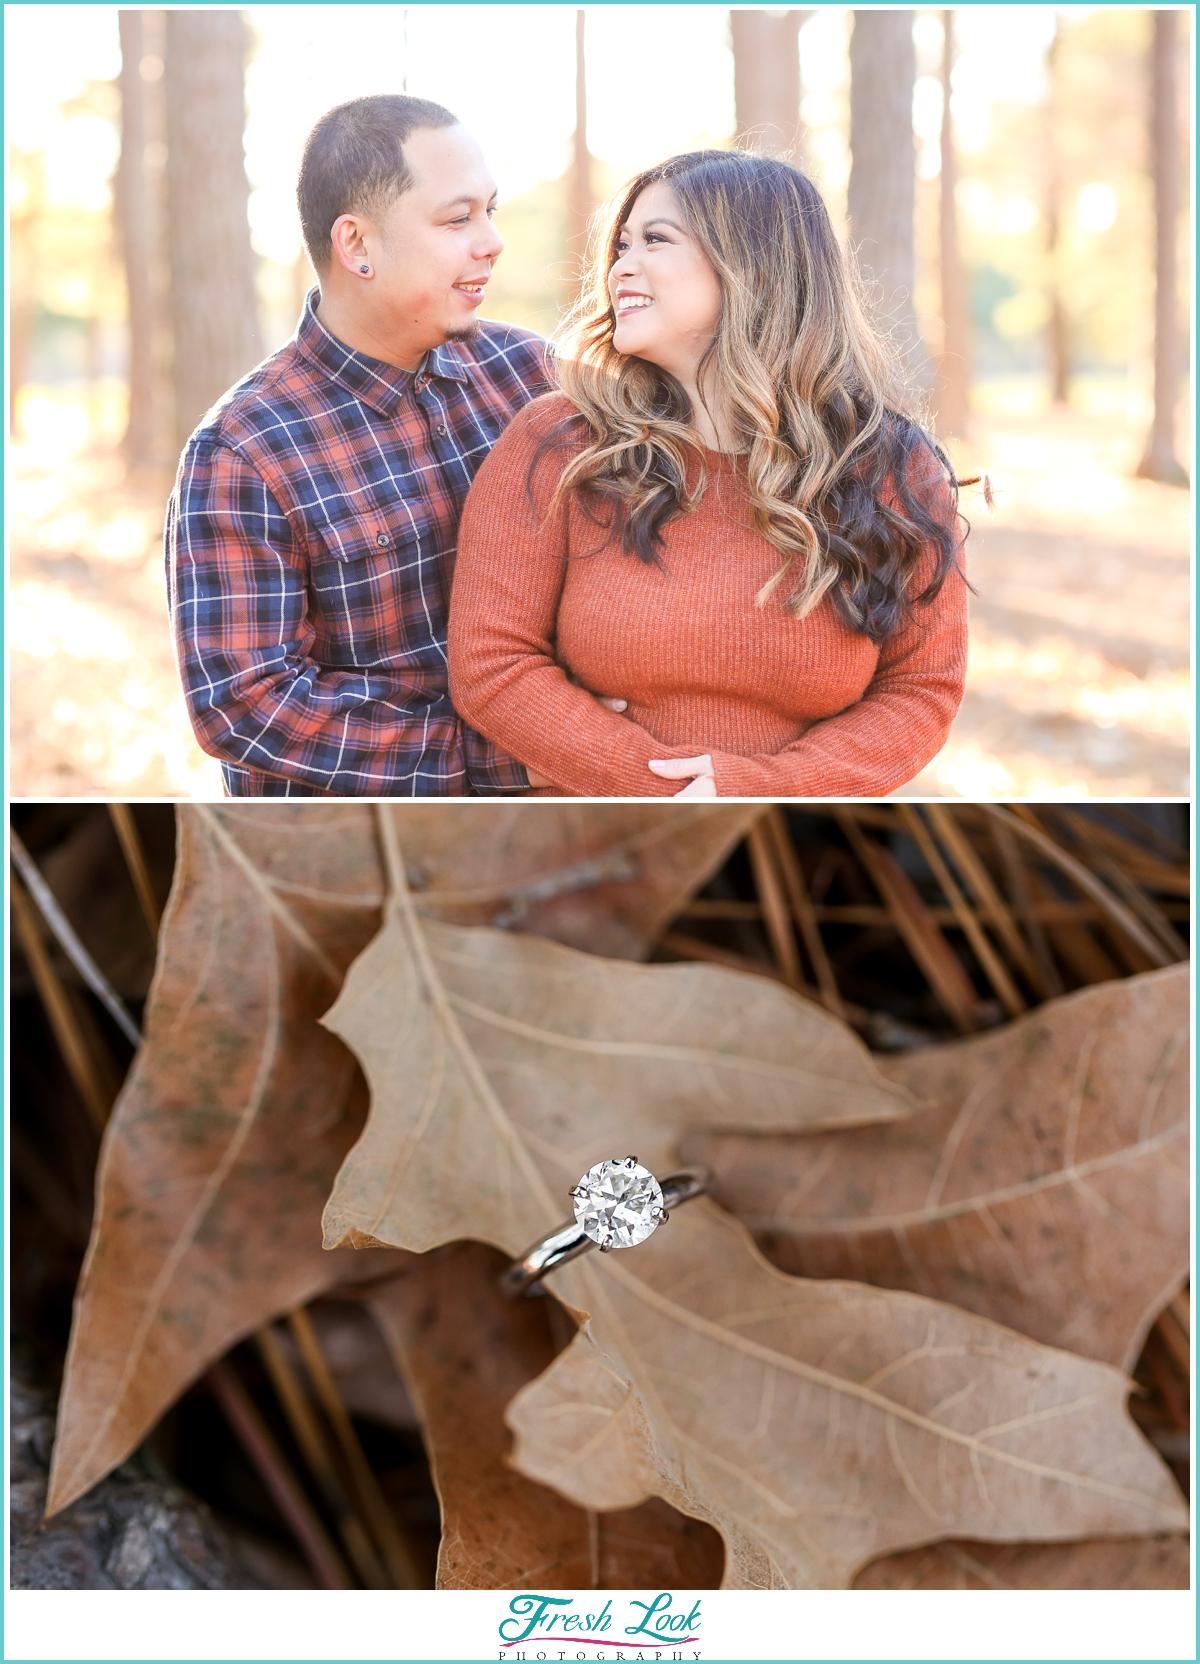 fall engagement photo ideas